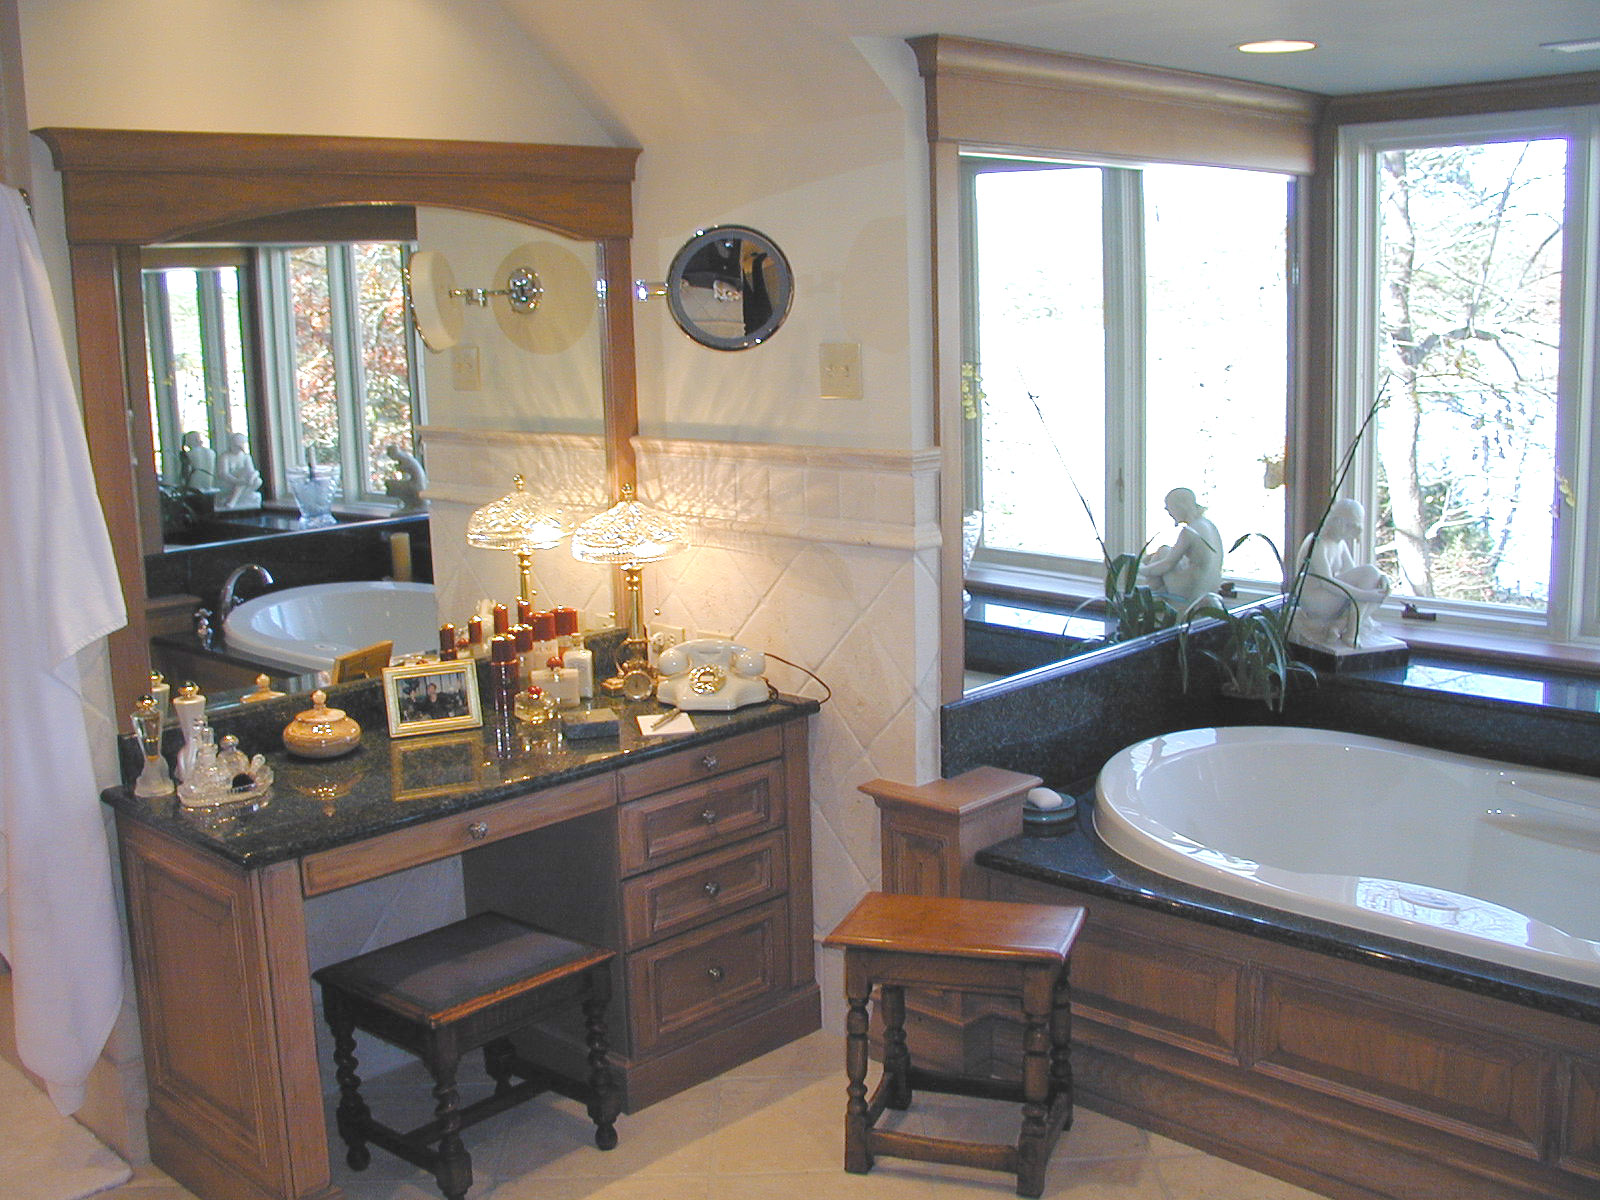 Bathroom renovation richmond virginia classic kitchens of virginia for Bathroom renovation richmond va